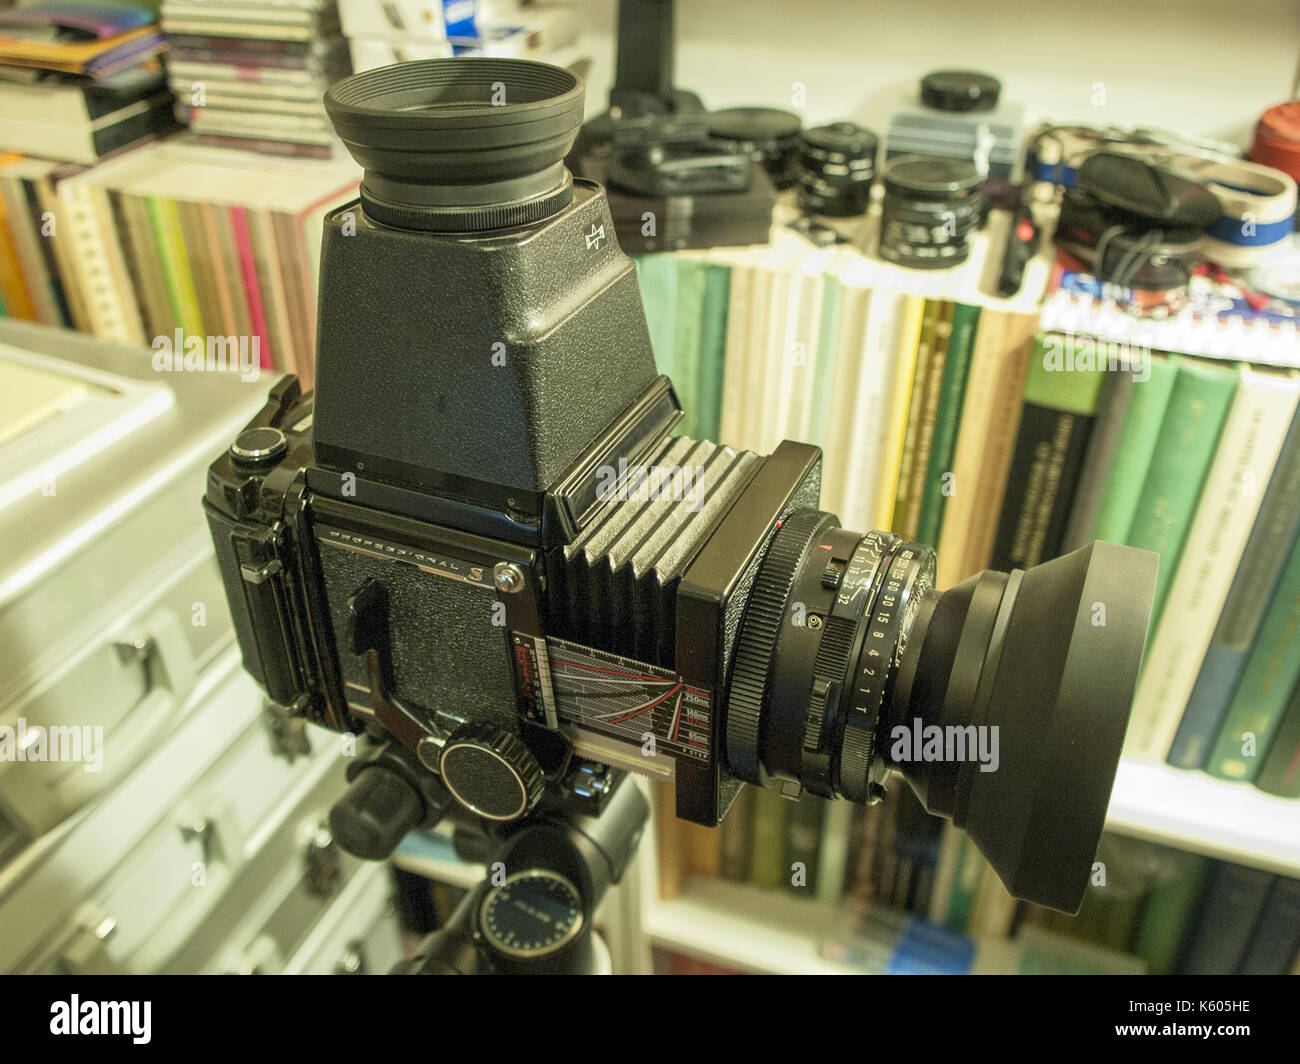 Mamiya RB67 Professional S - Medium Format Film Camera Stock